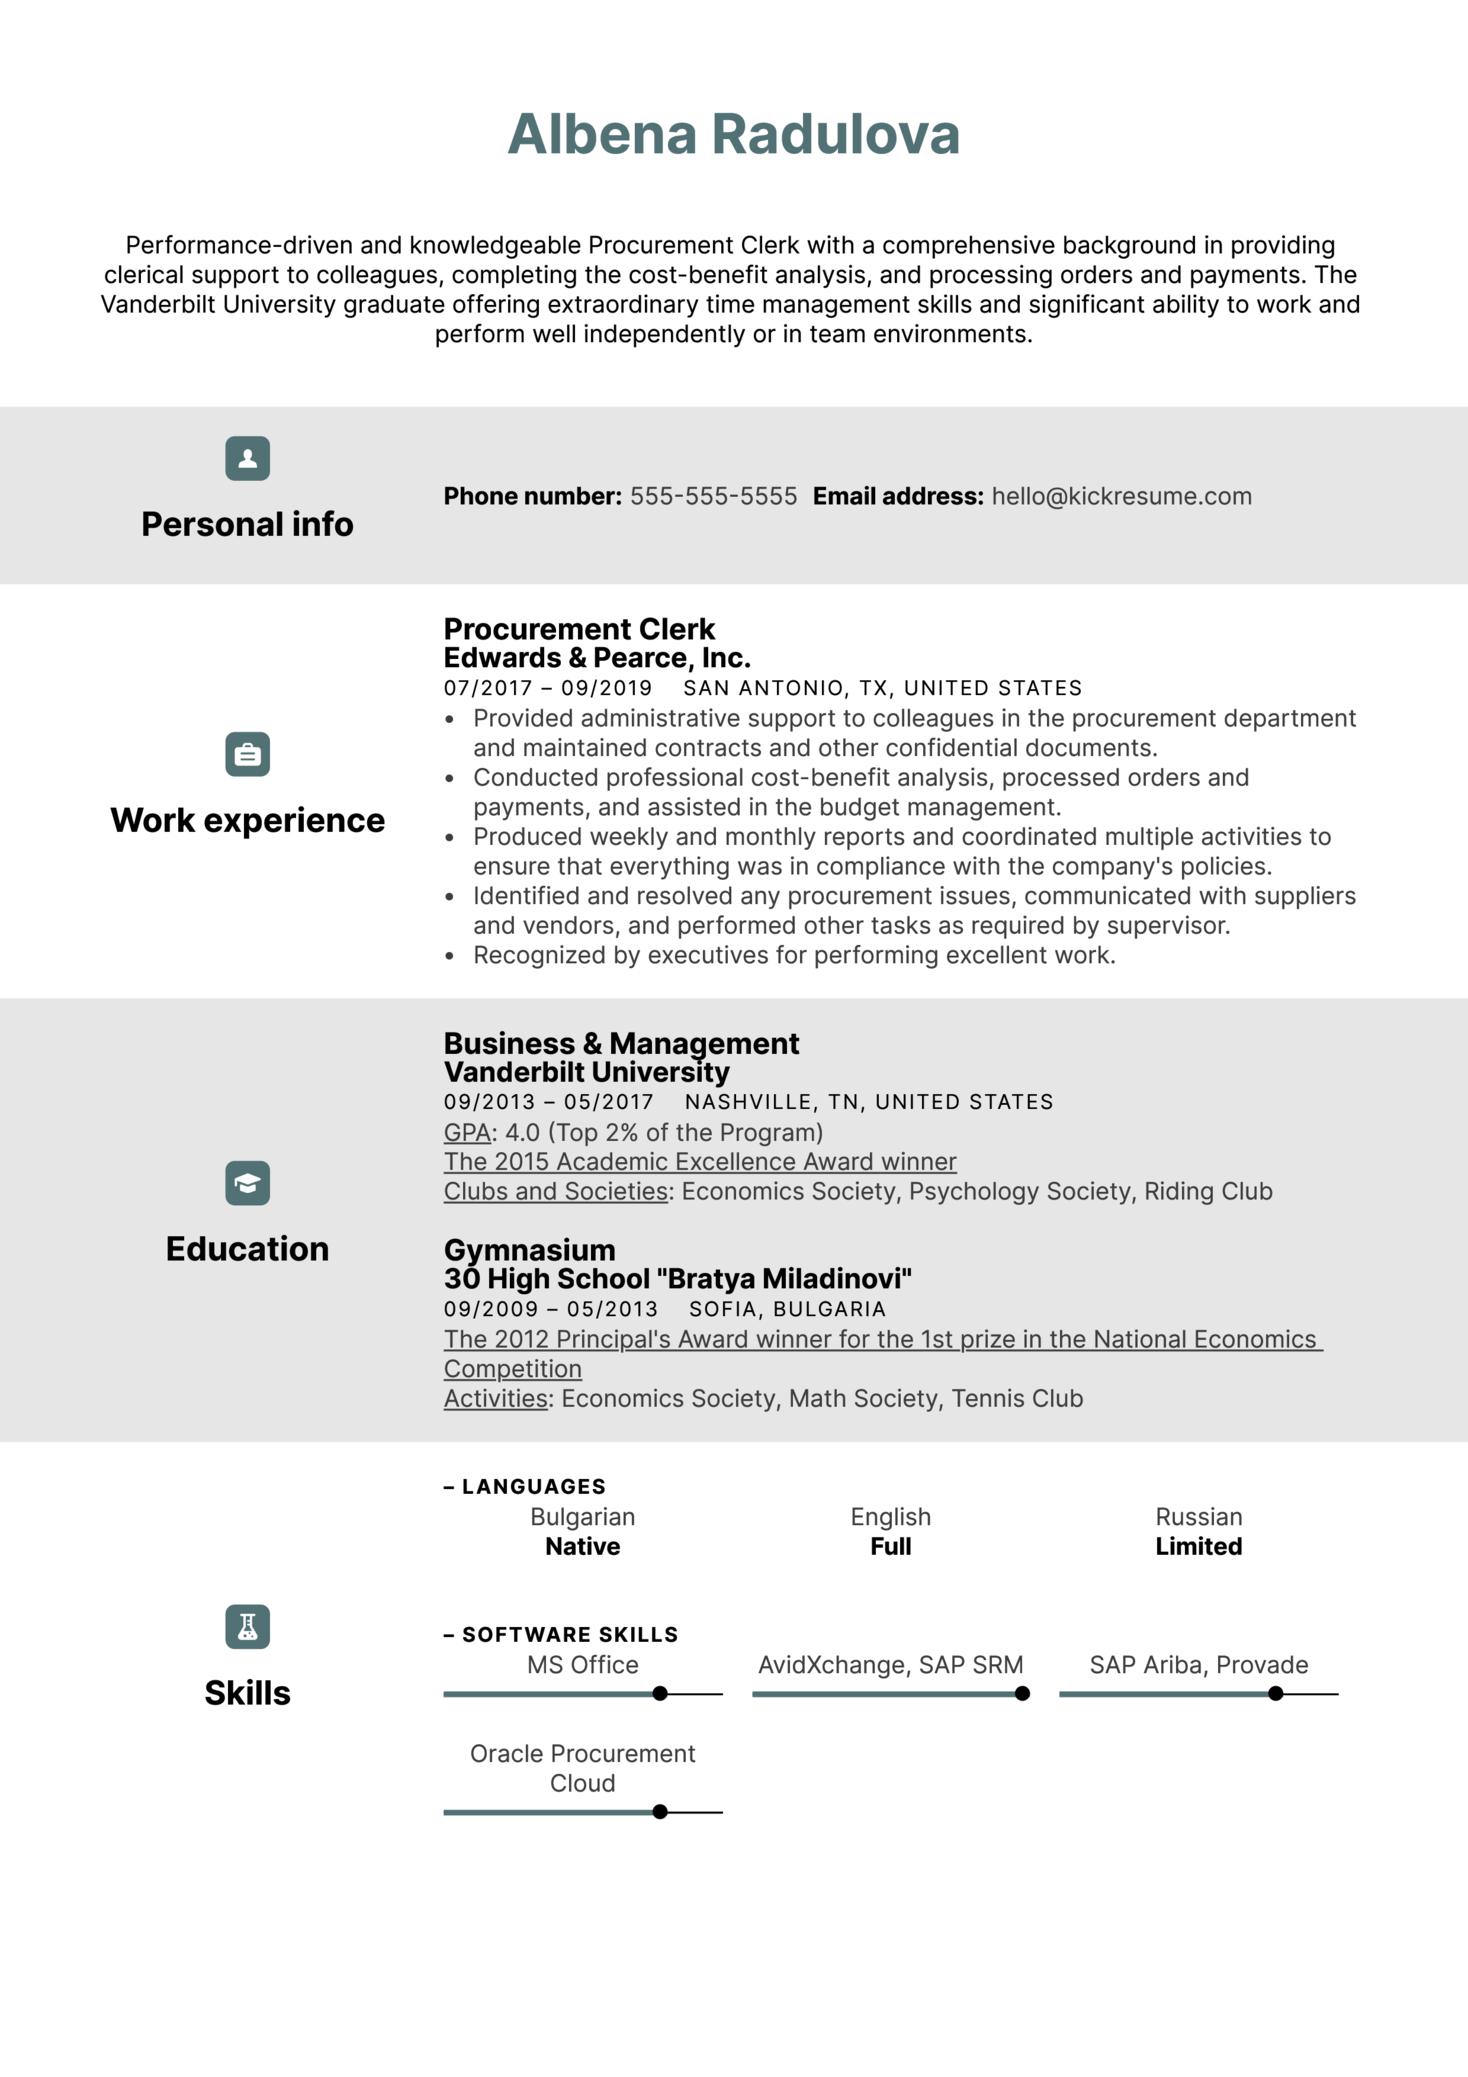 Procurement Clerk Resume Sample (Part 1)